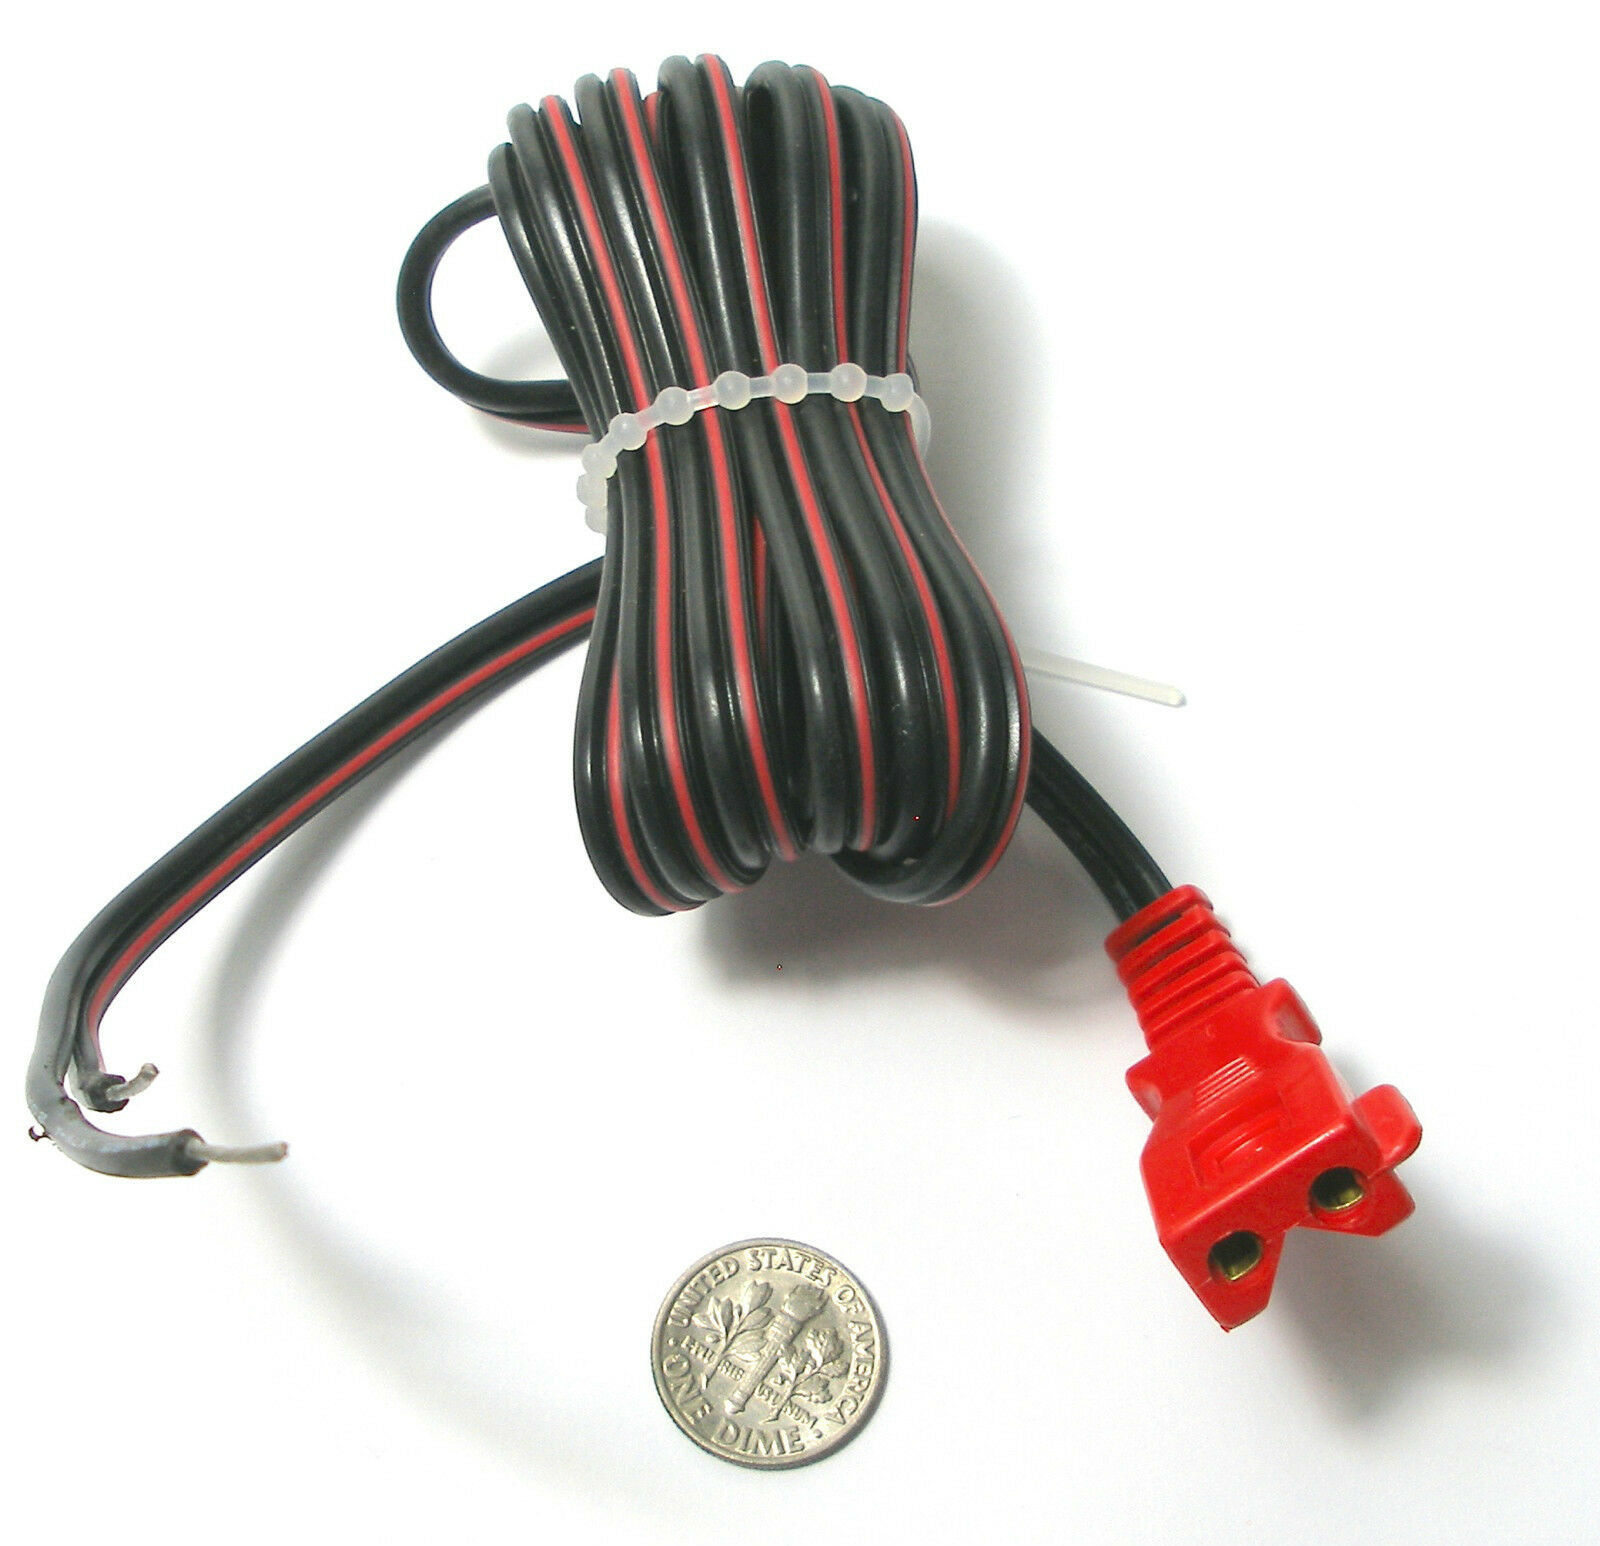 6' Vintage TYCO HO Slot Car Track Transformer HEAVYDUTY POWER PIG TAIL Plug Lead - $6.92